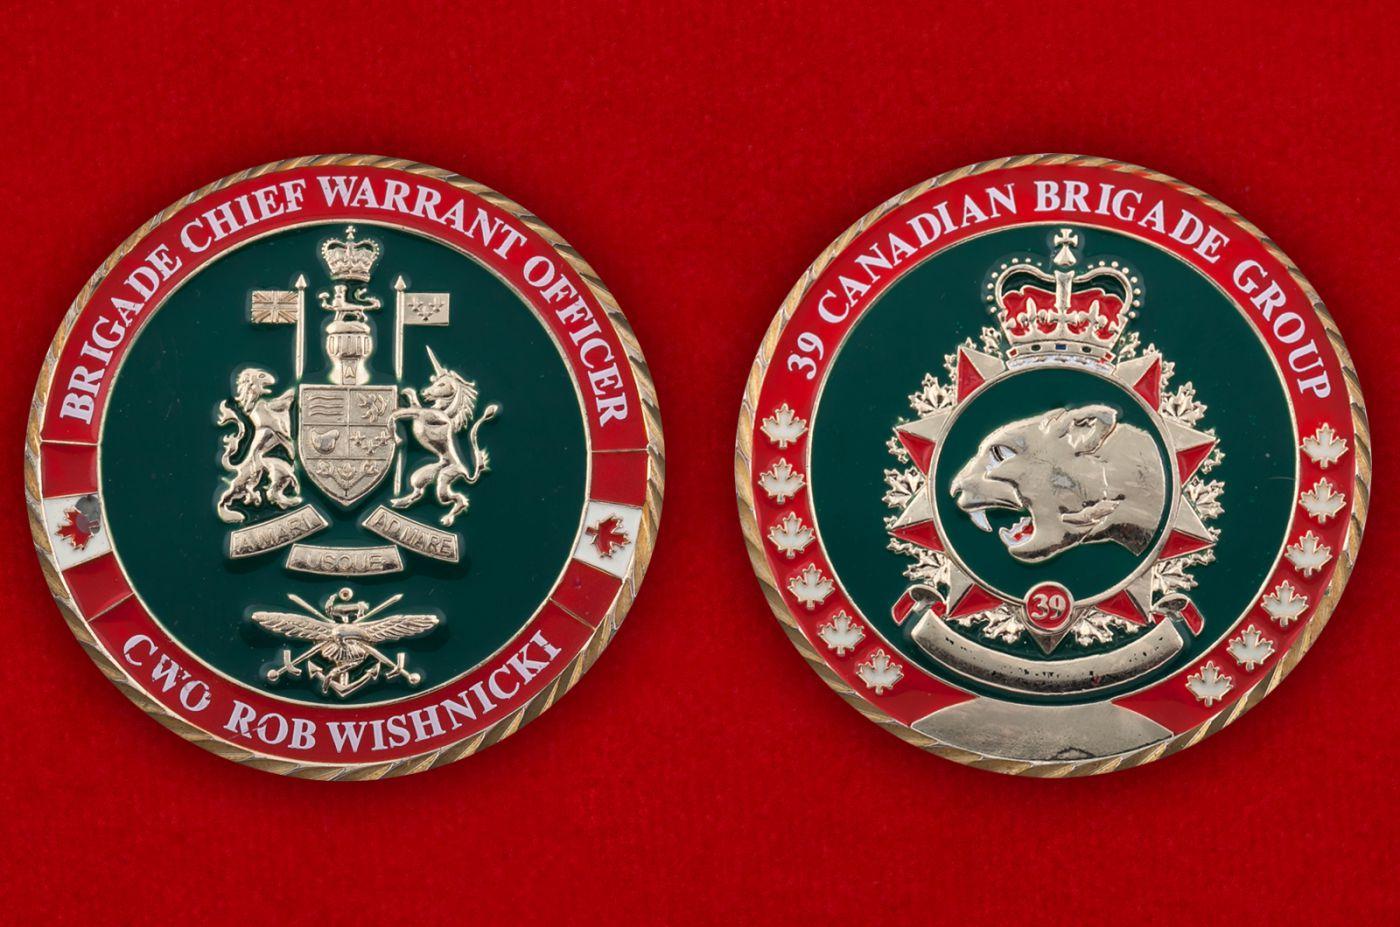 Челлендж коин 39-й Канадской бригады - аверс и реверс